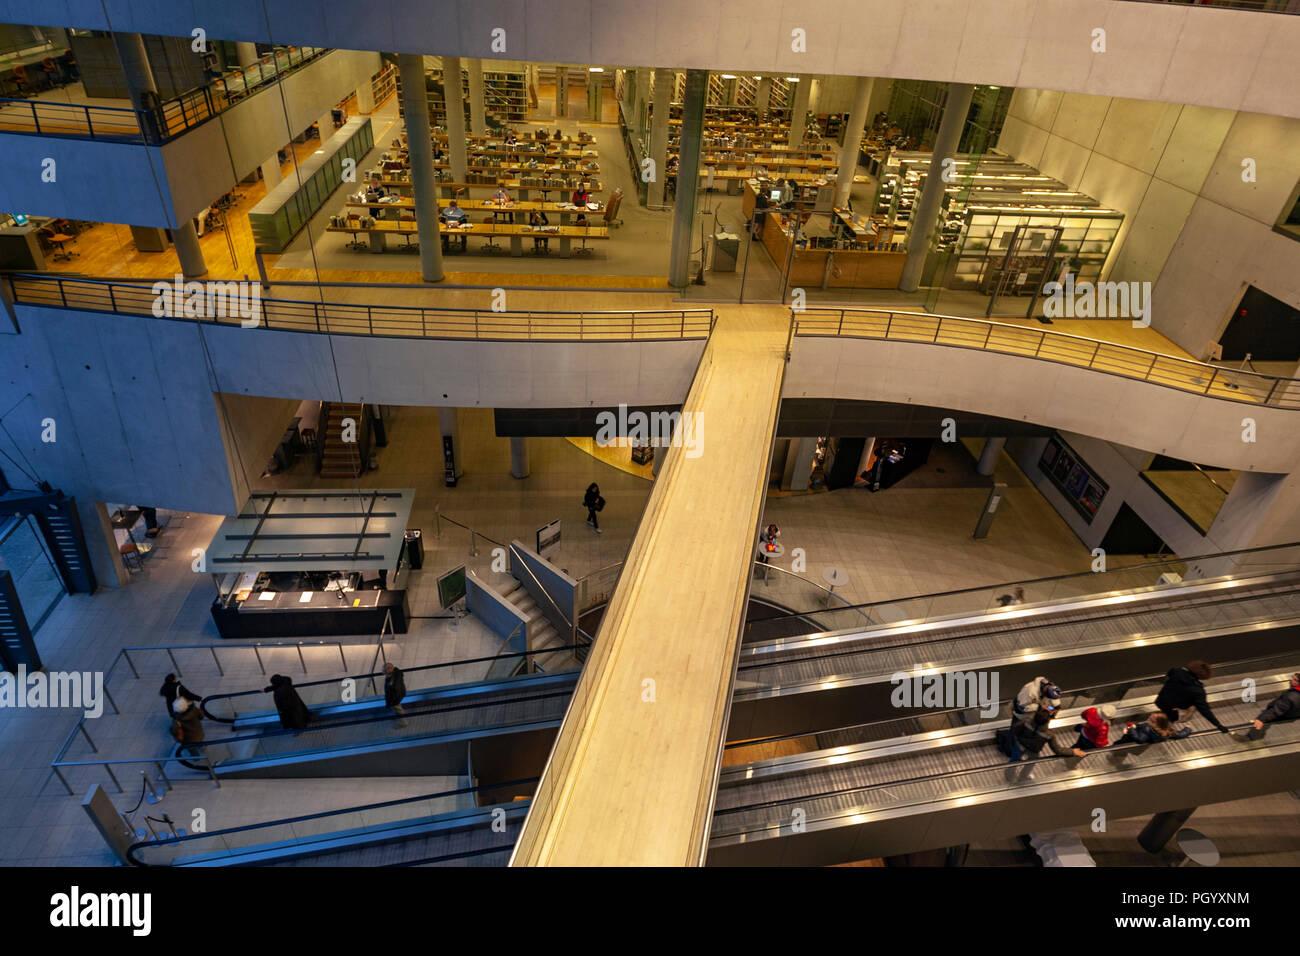 Royal Danish Library, The Black Diamond library, Designed by architects Schmidt Hammer Lassen, Slotsholmen, Copenhagen, Denmark. Stock Photo